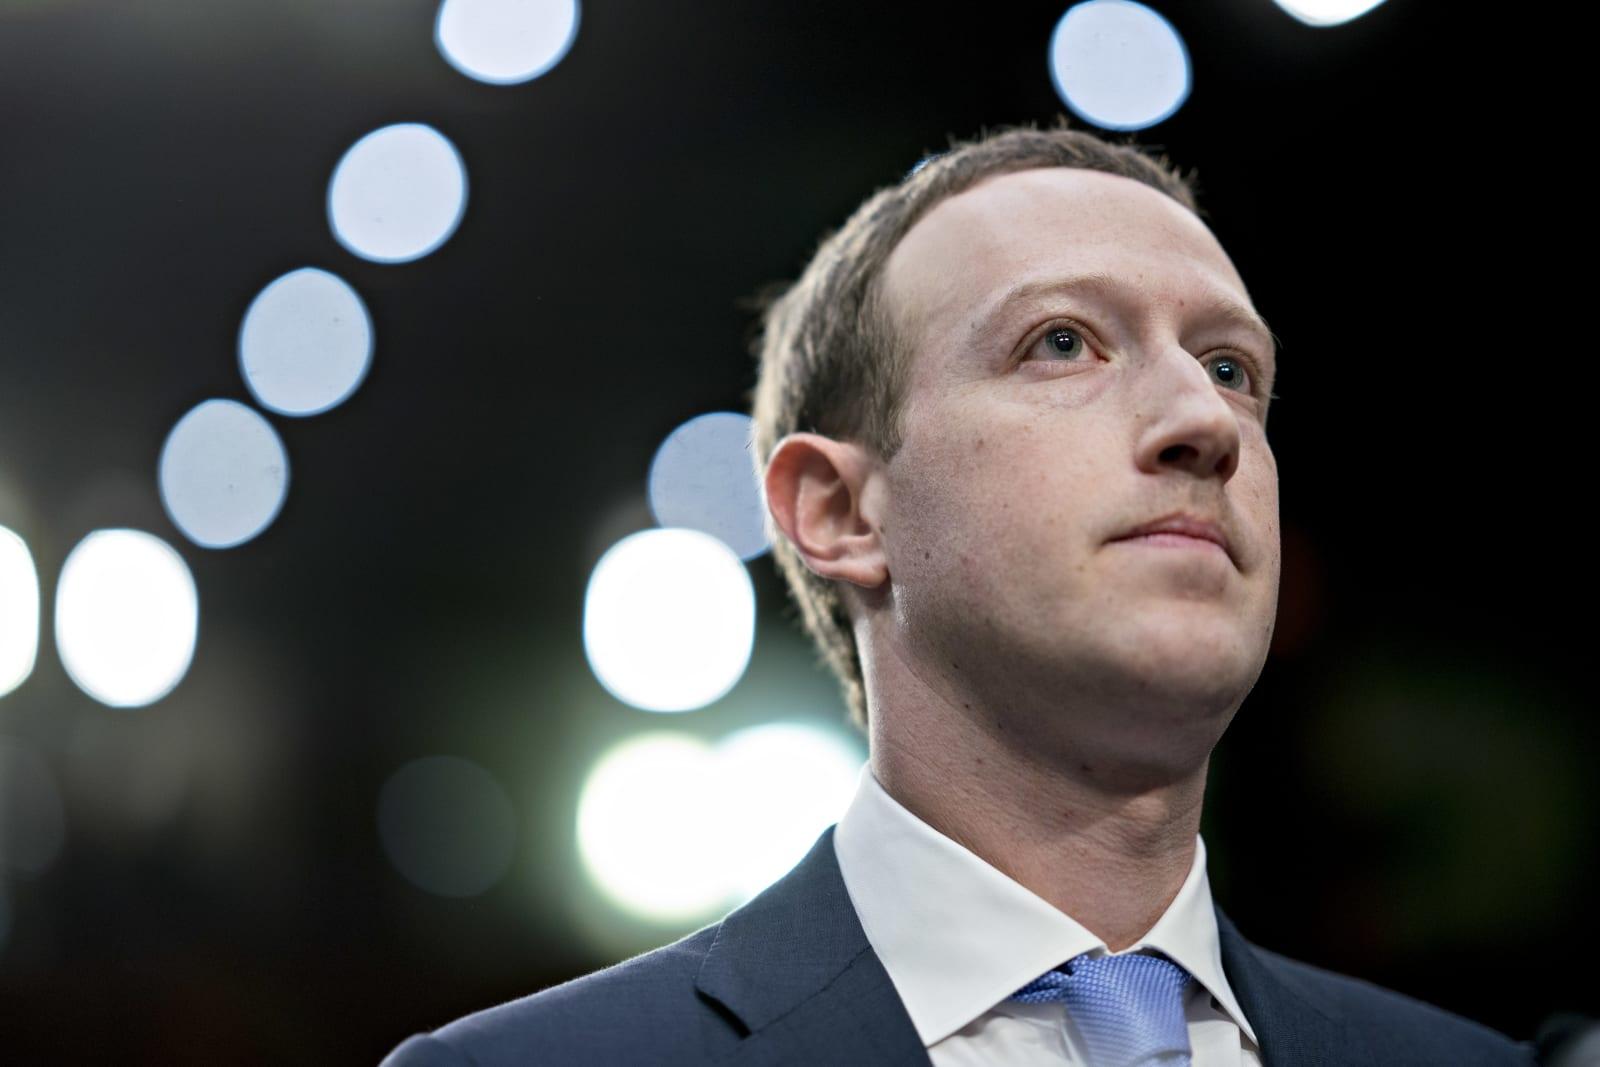 Facebook CEO Mark Zuckerberg Testifies Before The Senate Judiciary And Commerce Committees